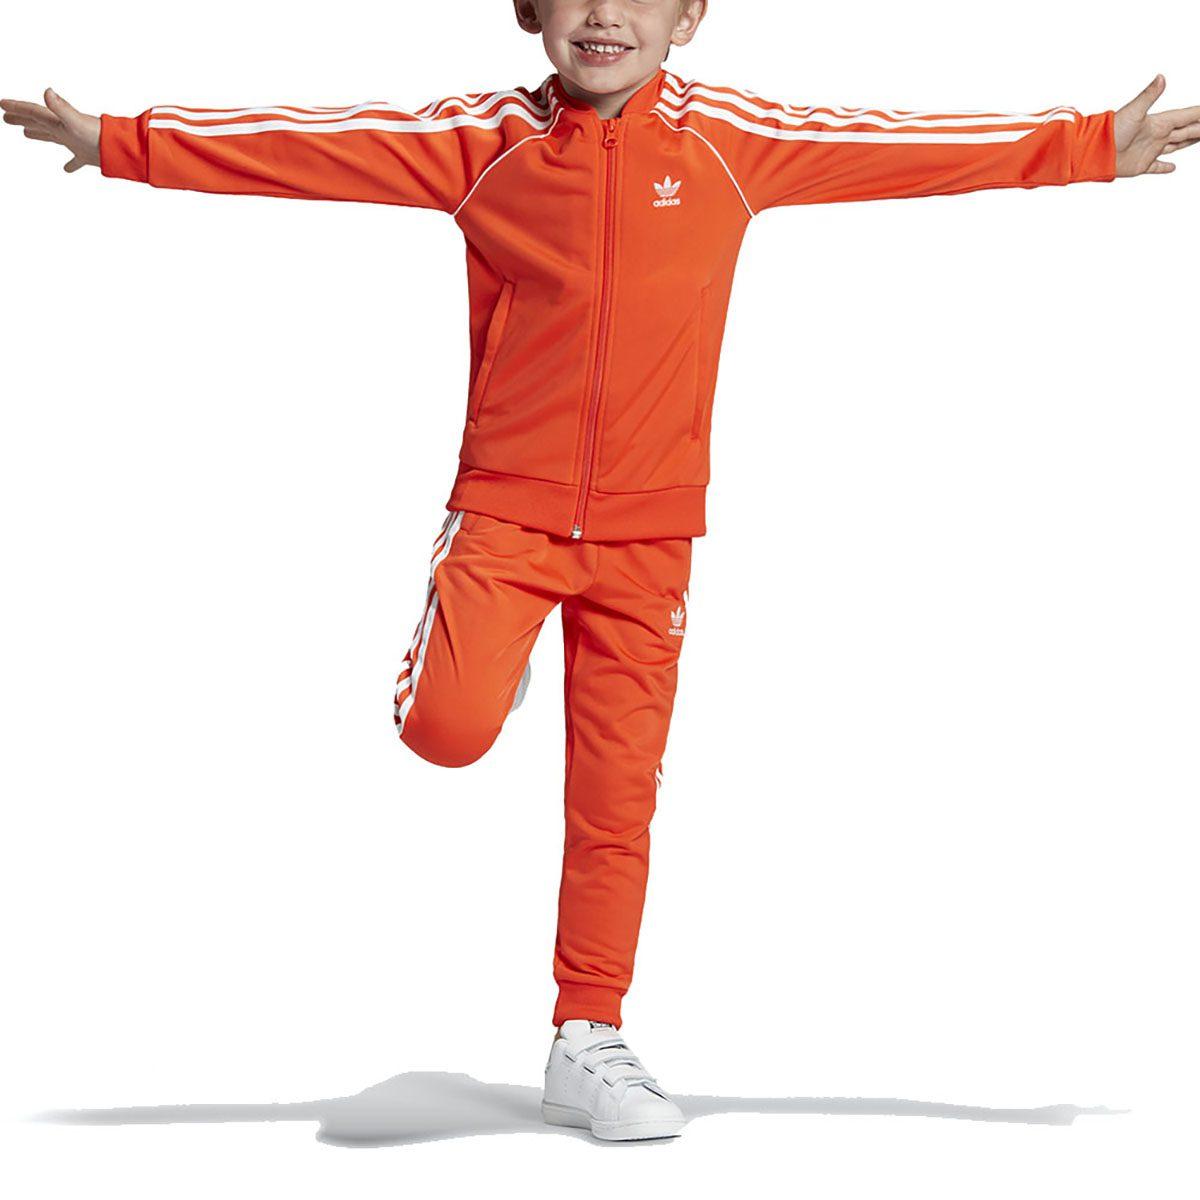 Adidas Originals Bébés SST Survêtement/Pantalon